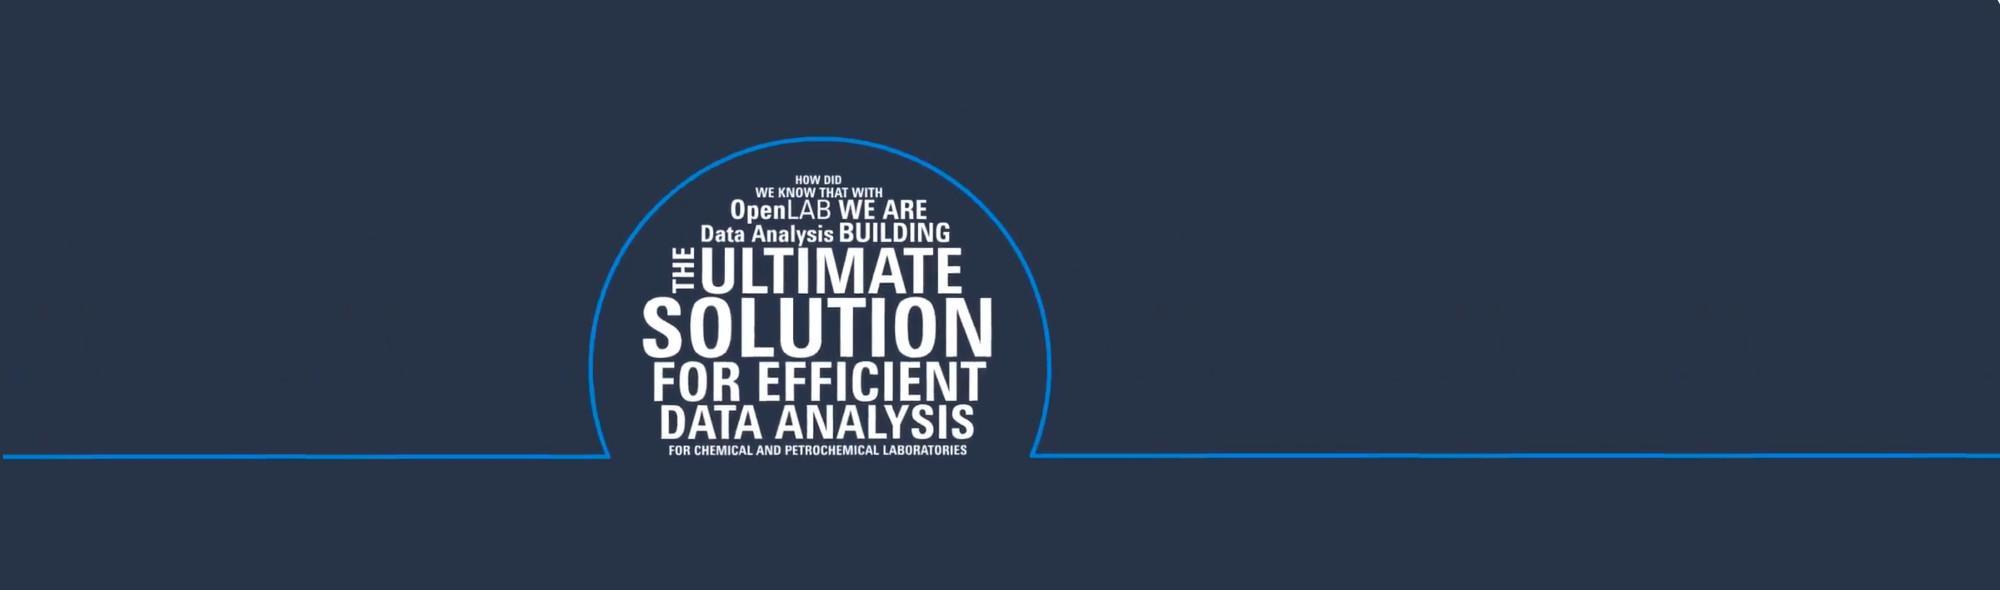 Agilent Infomercial OpenLAB Data Analysis